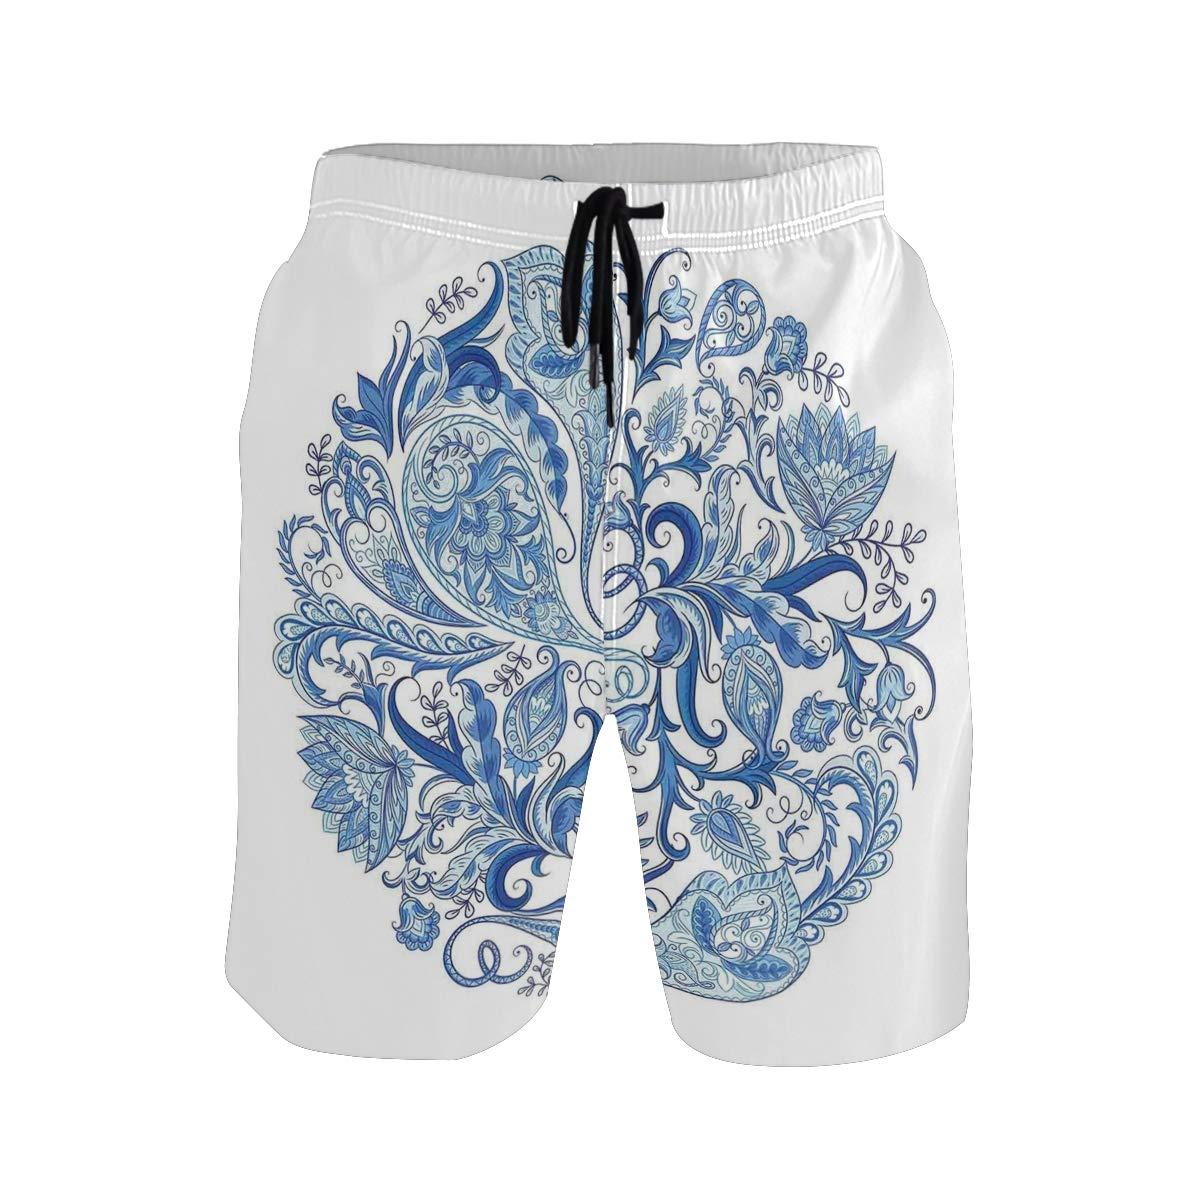 COVASA Mens Summer ShortsClassic Paisley Petals Circular Shape Blue Tones Swir